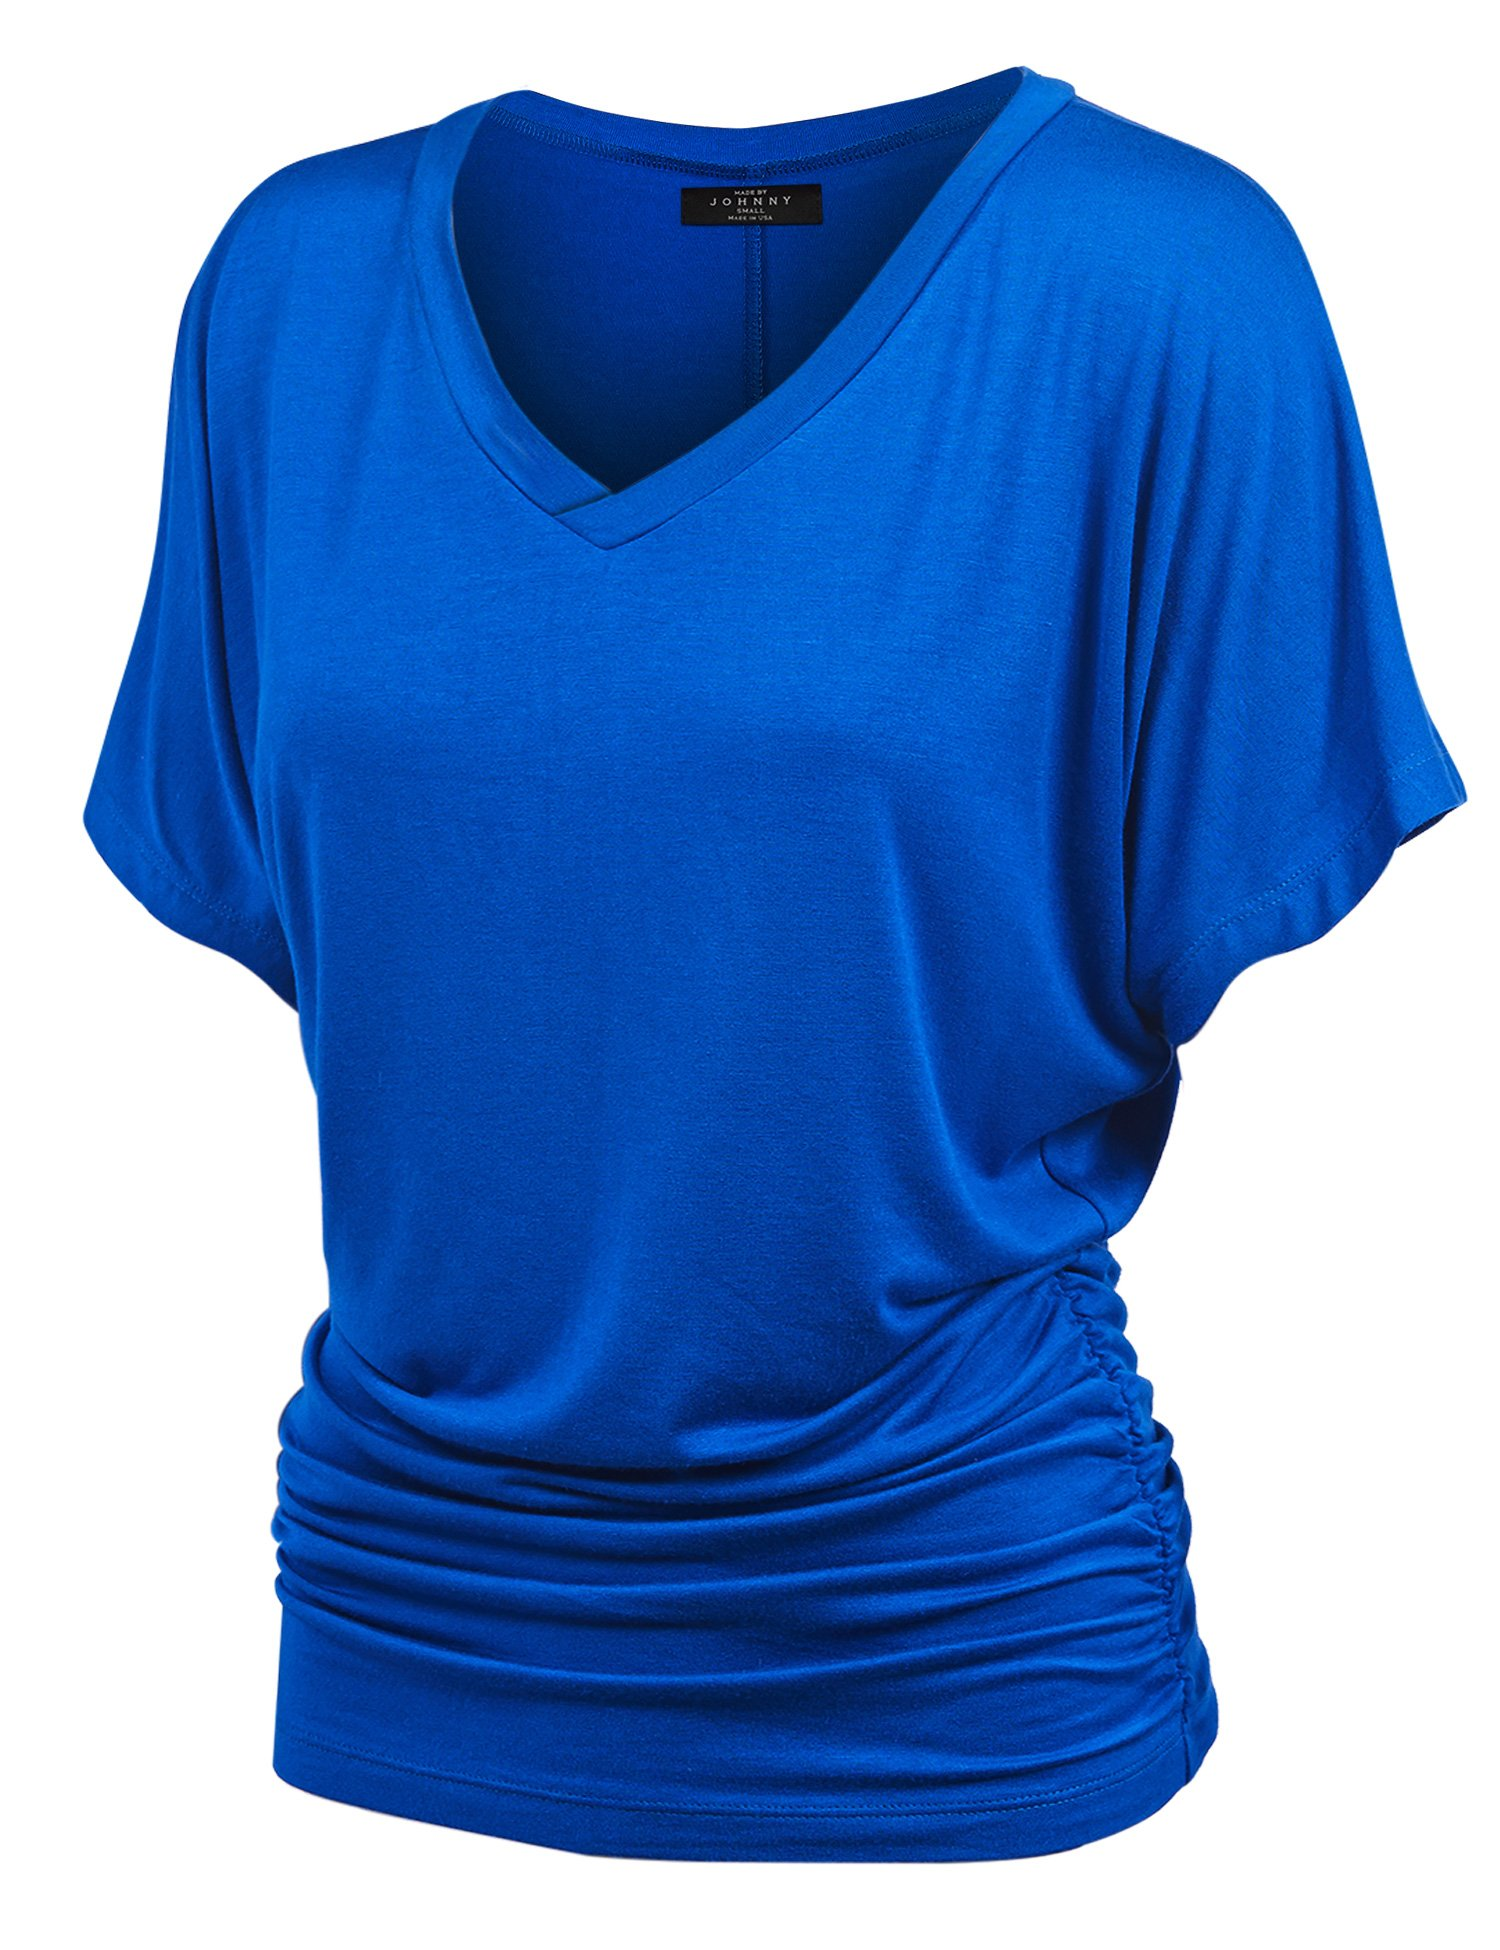 WT1037 Womens V Neck Short Sleeve Dolman Top with Side Shirring XXL Royal_Brite